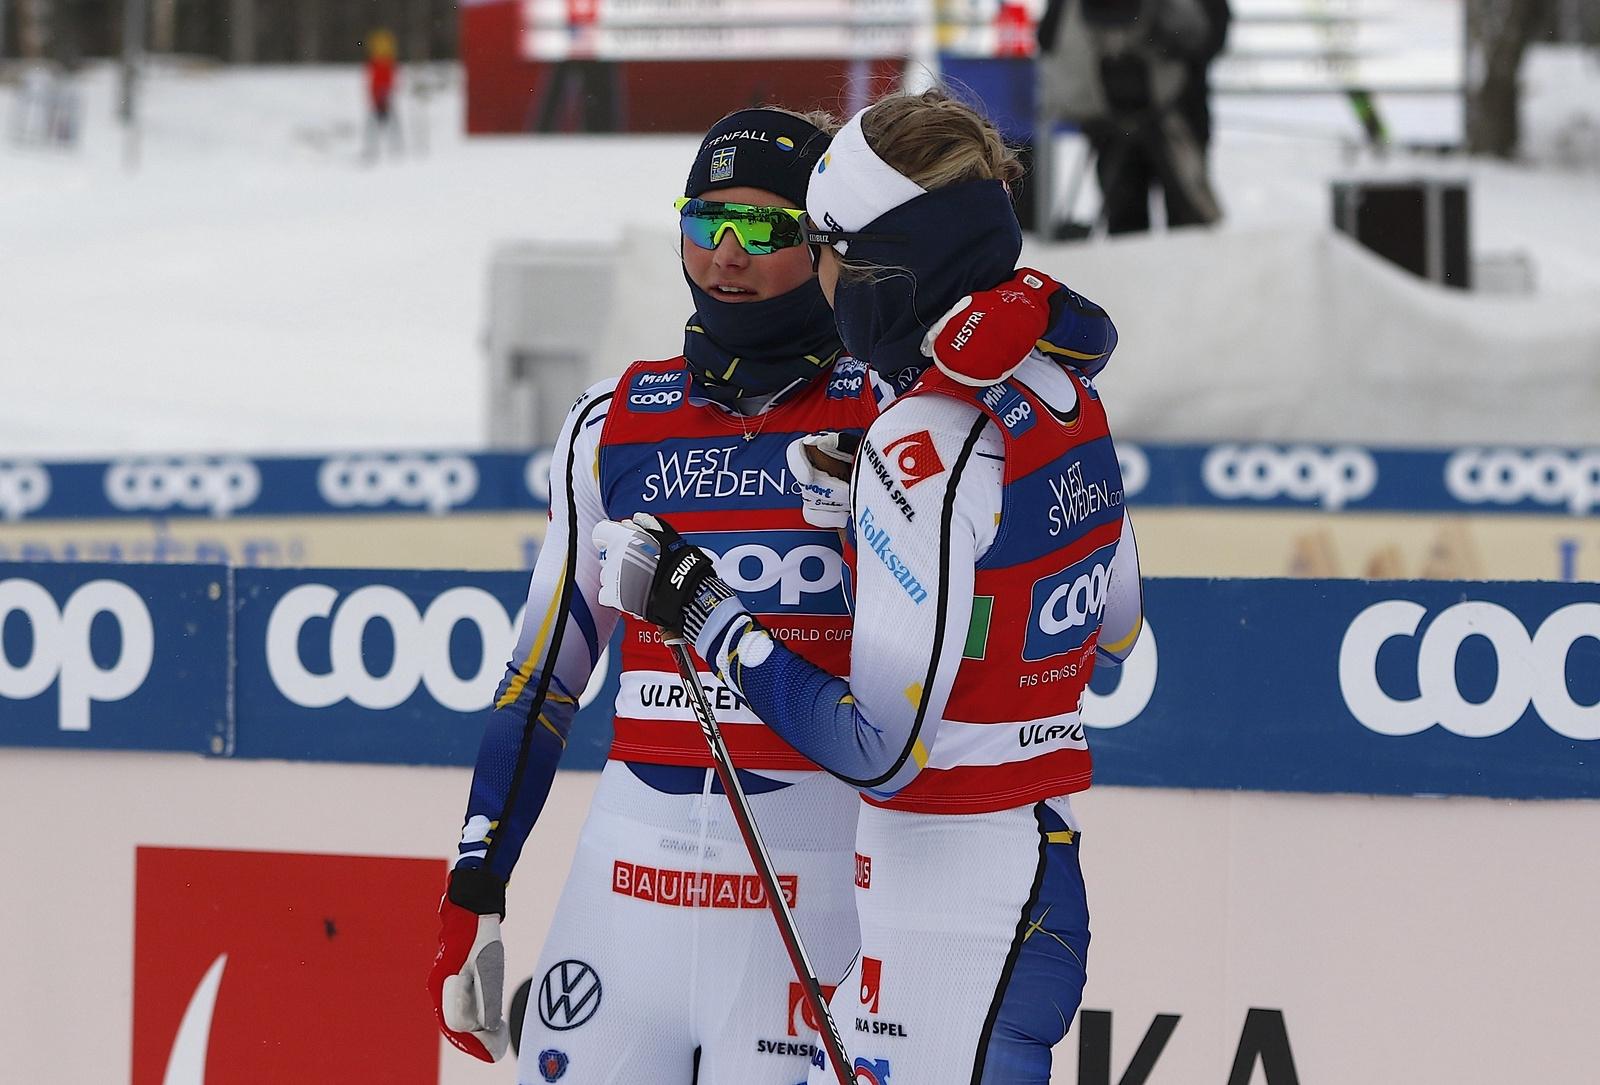 Världscupen i Ulricehamn 2021TeamsprintMaja Dahlqvist